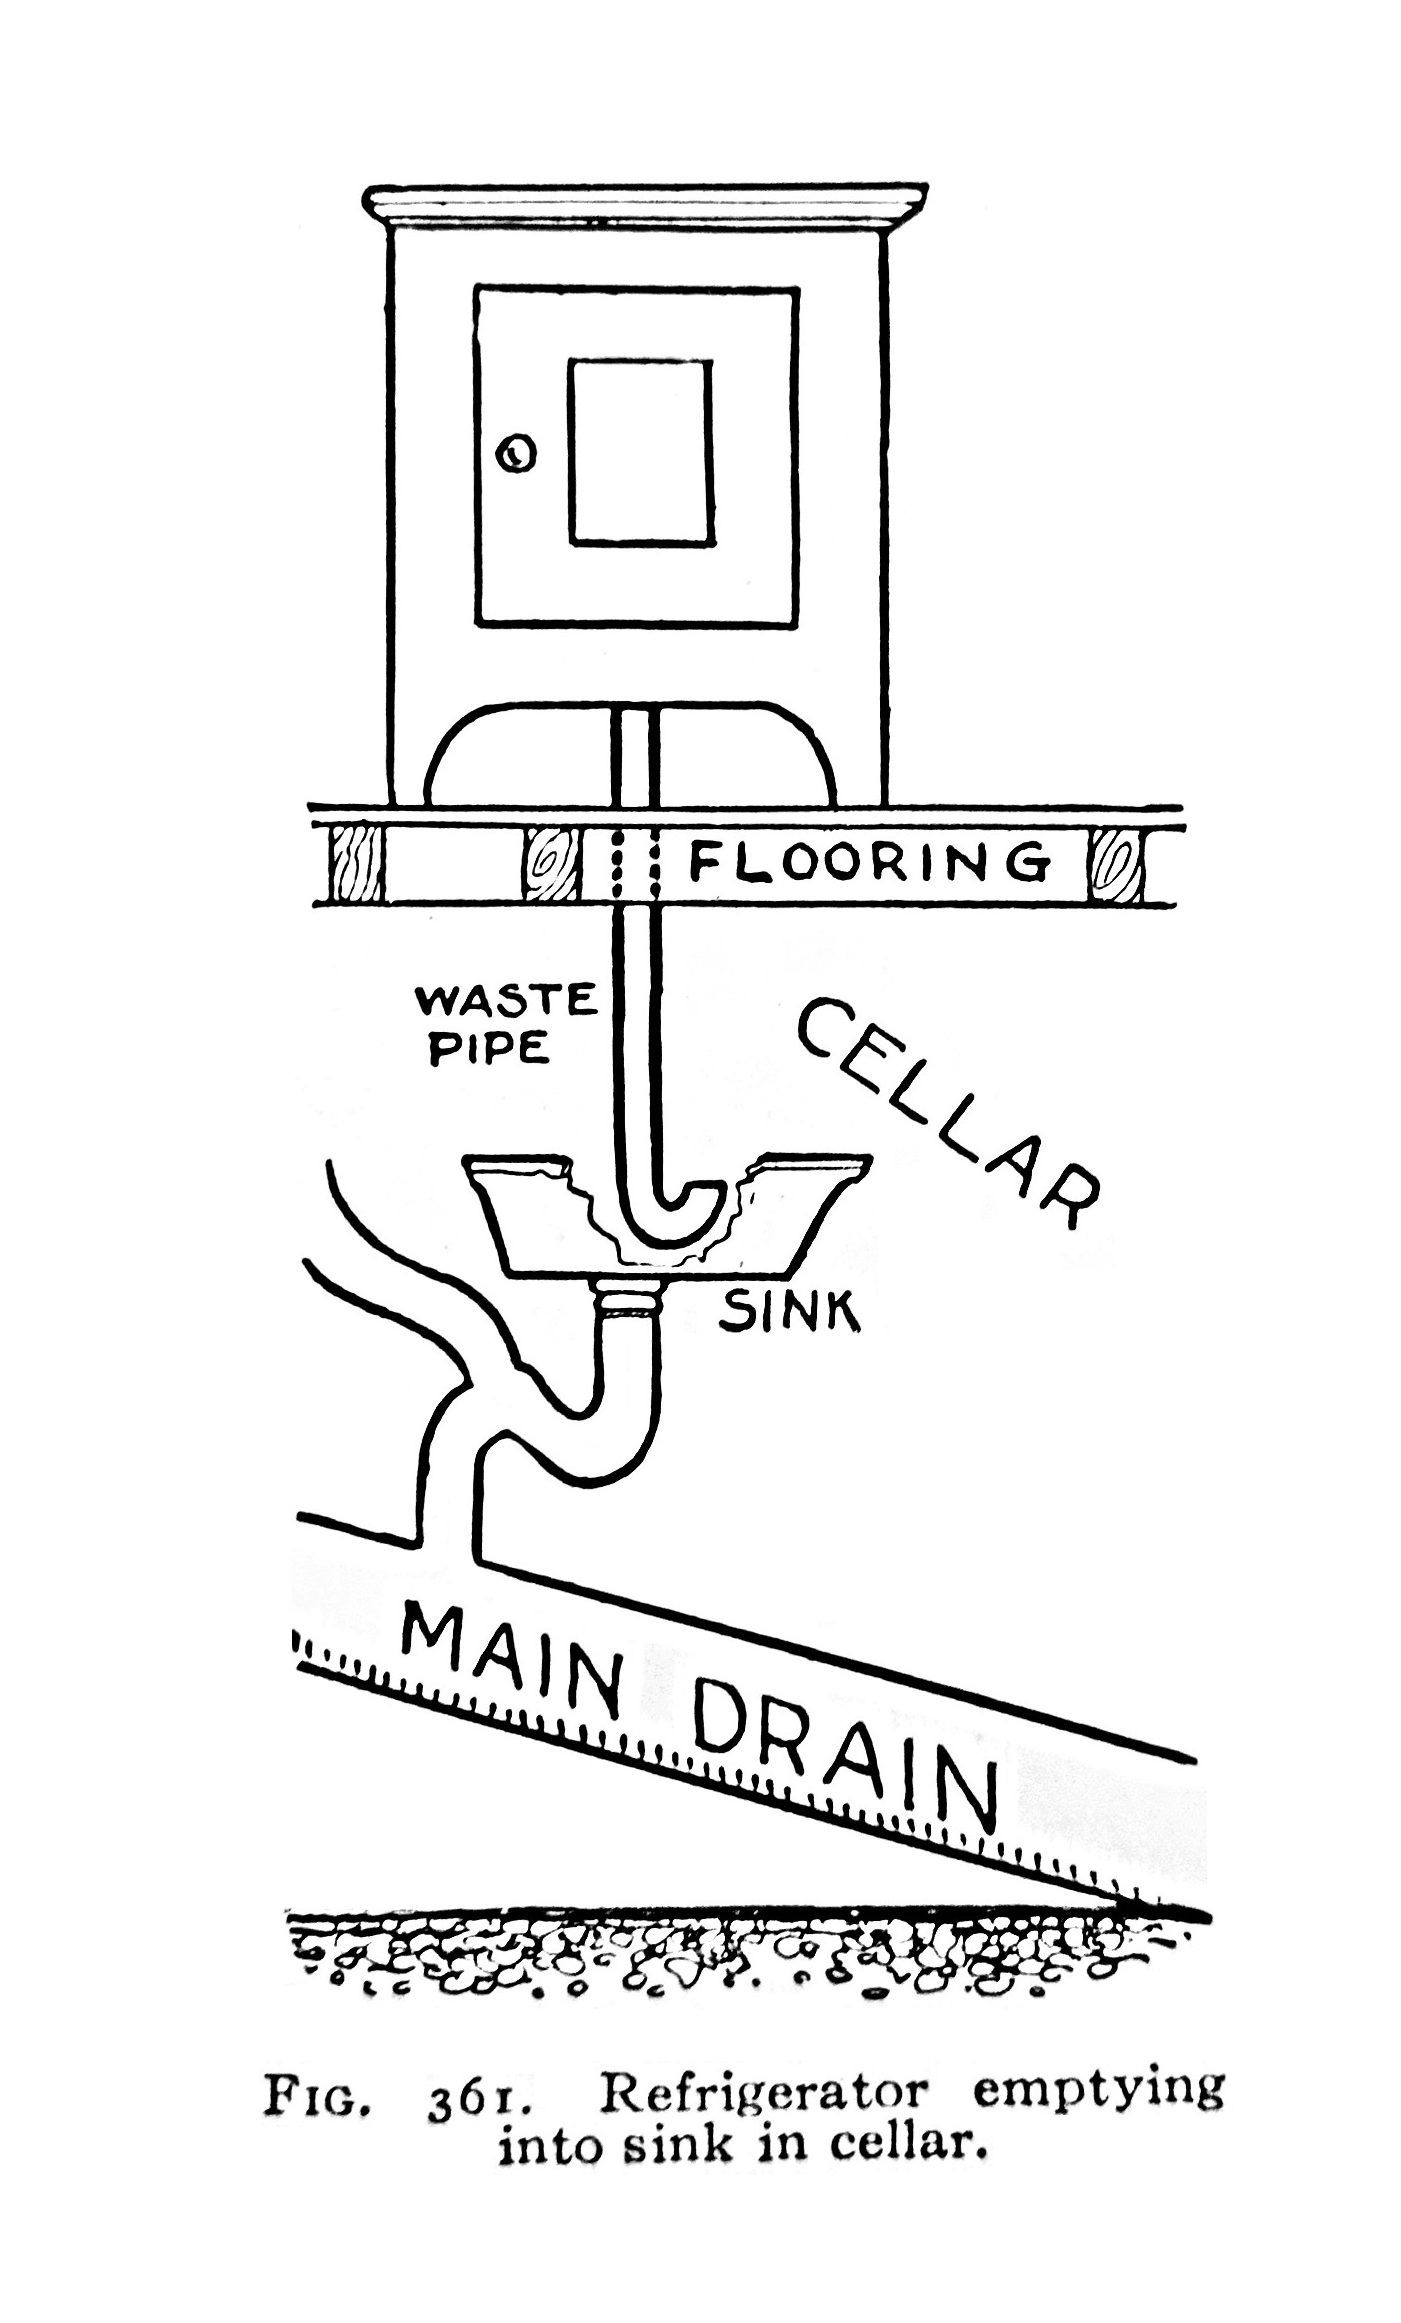 Refrigerator emptying into sink in cellar